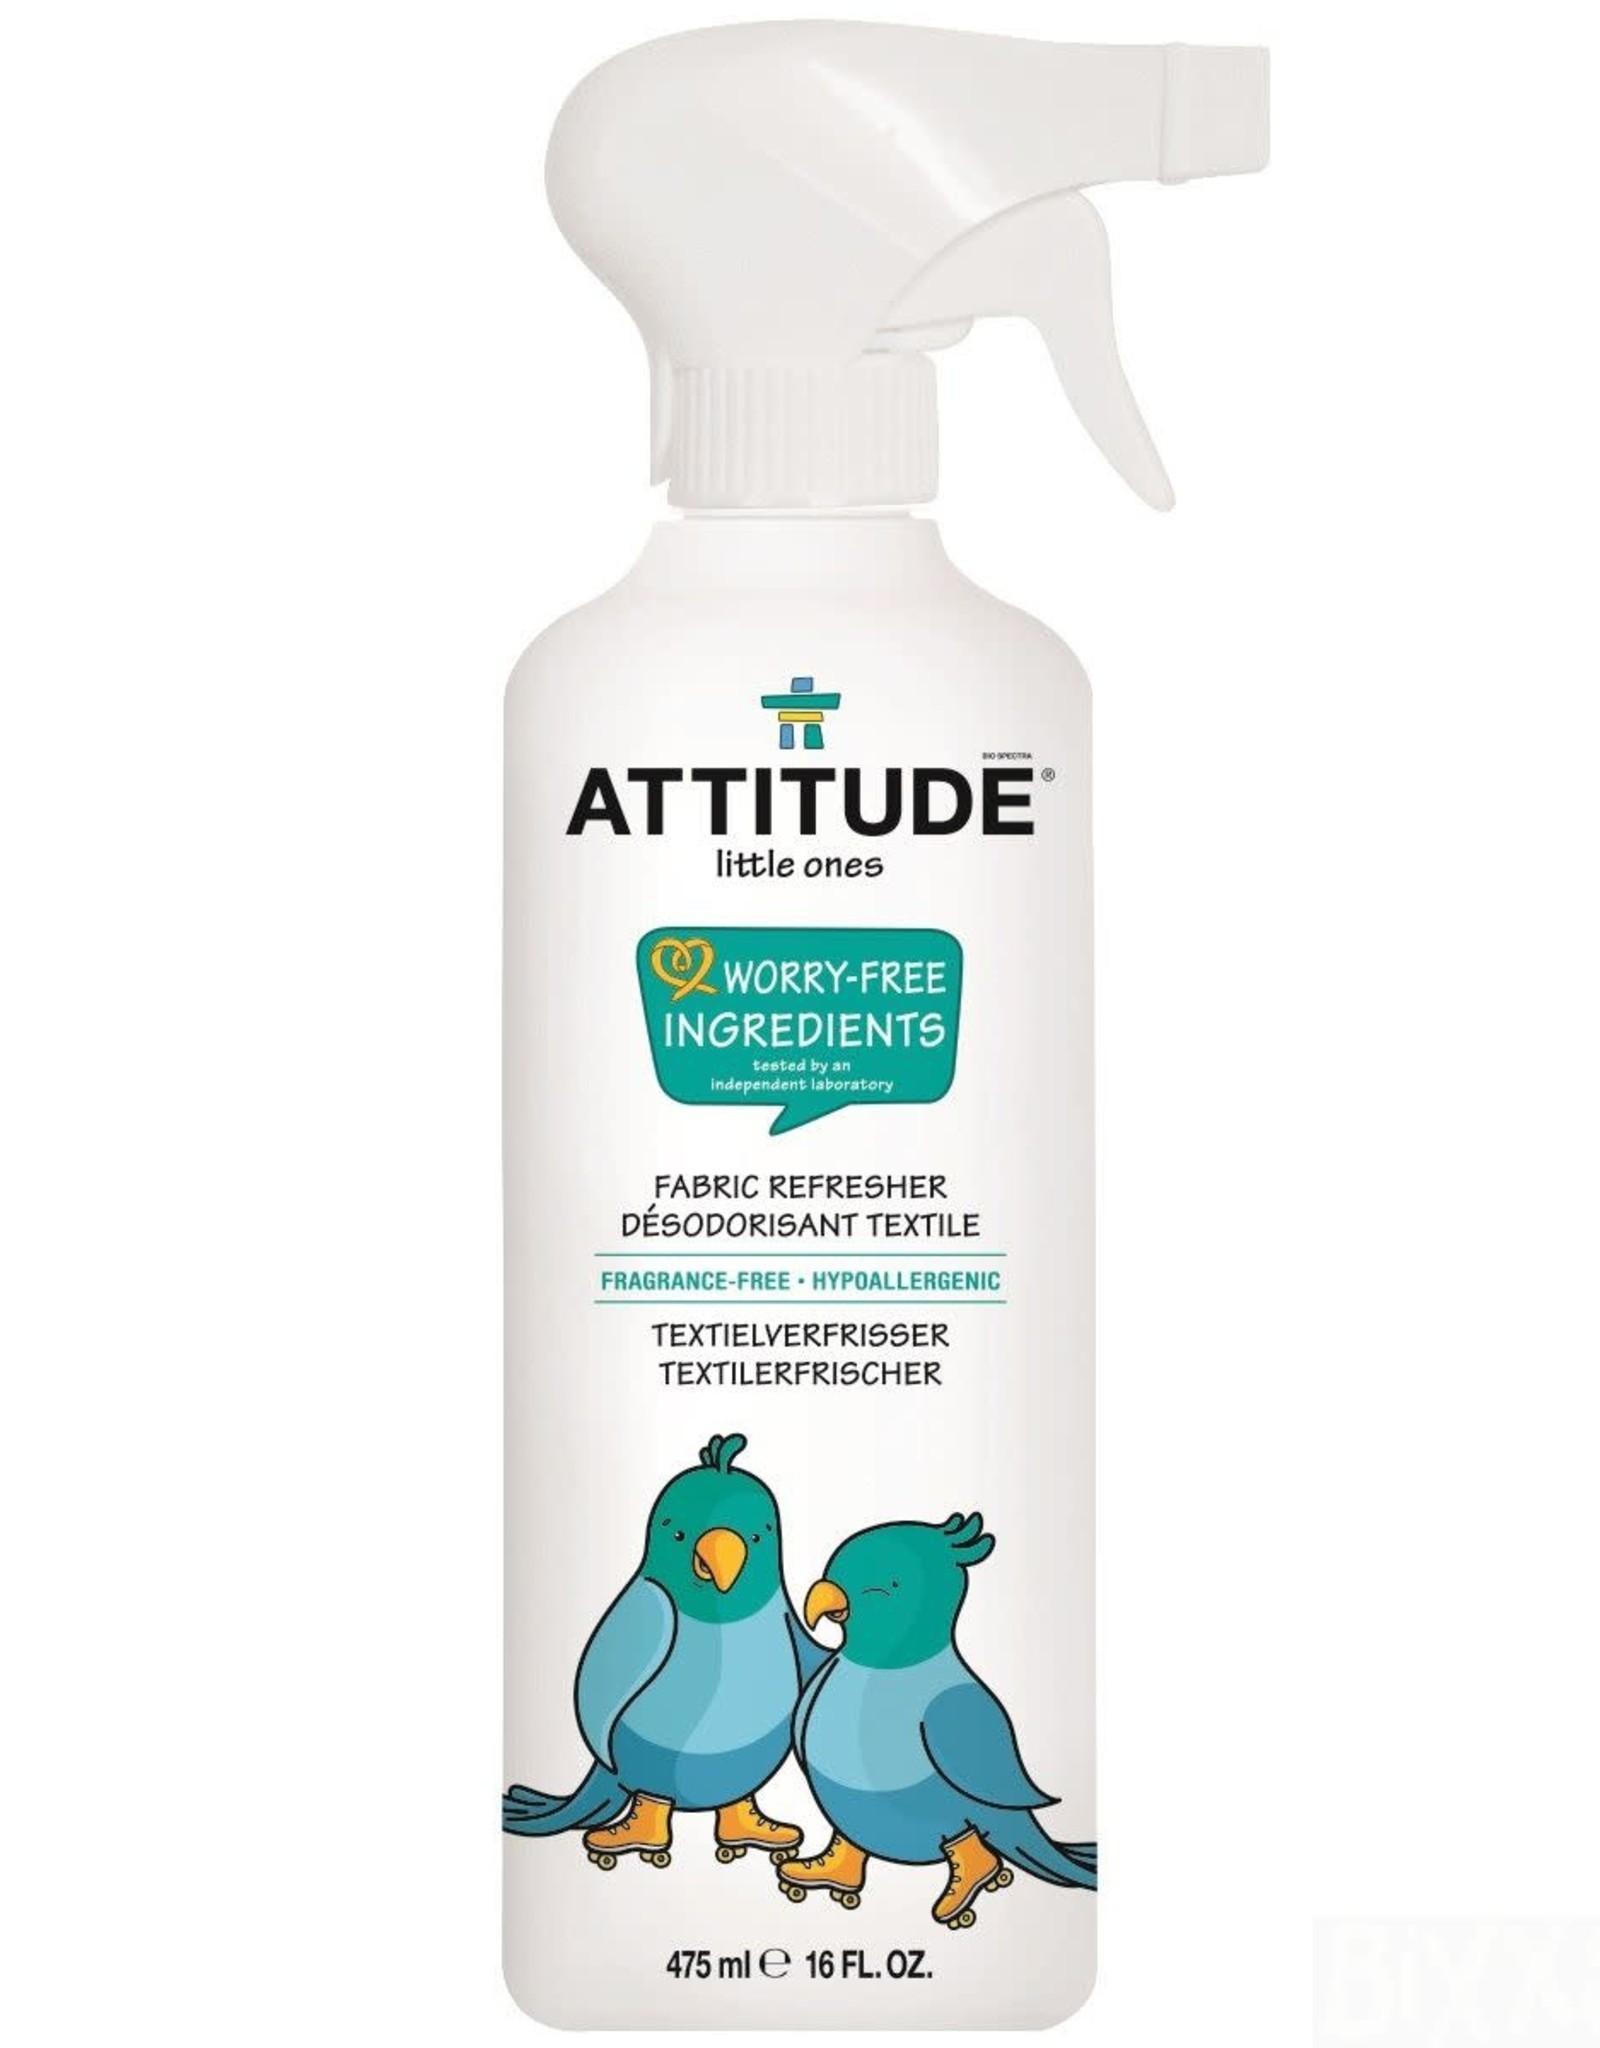 Attitude Attitude Little Ones Fabric Refresher 475 ml